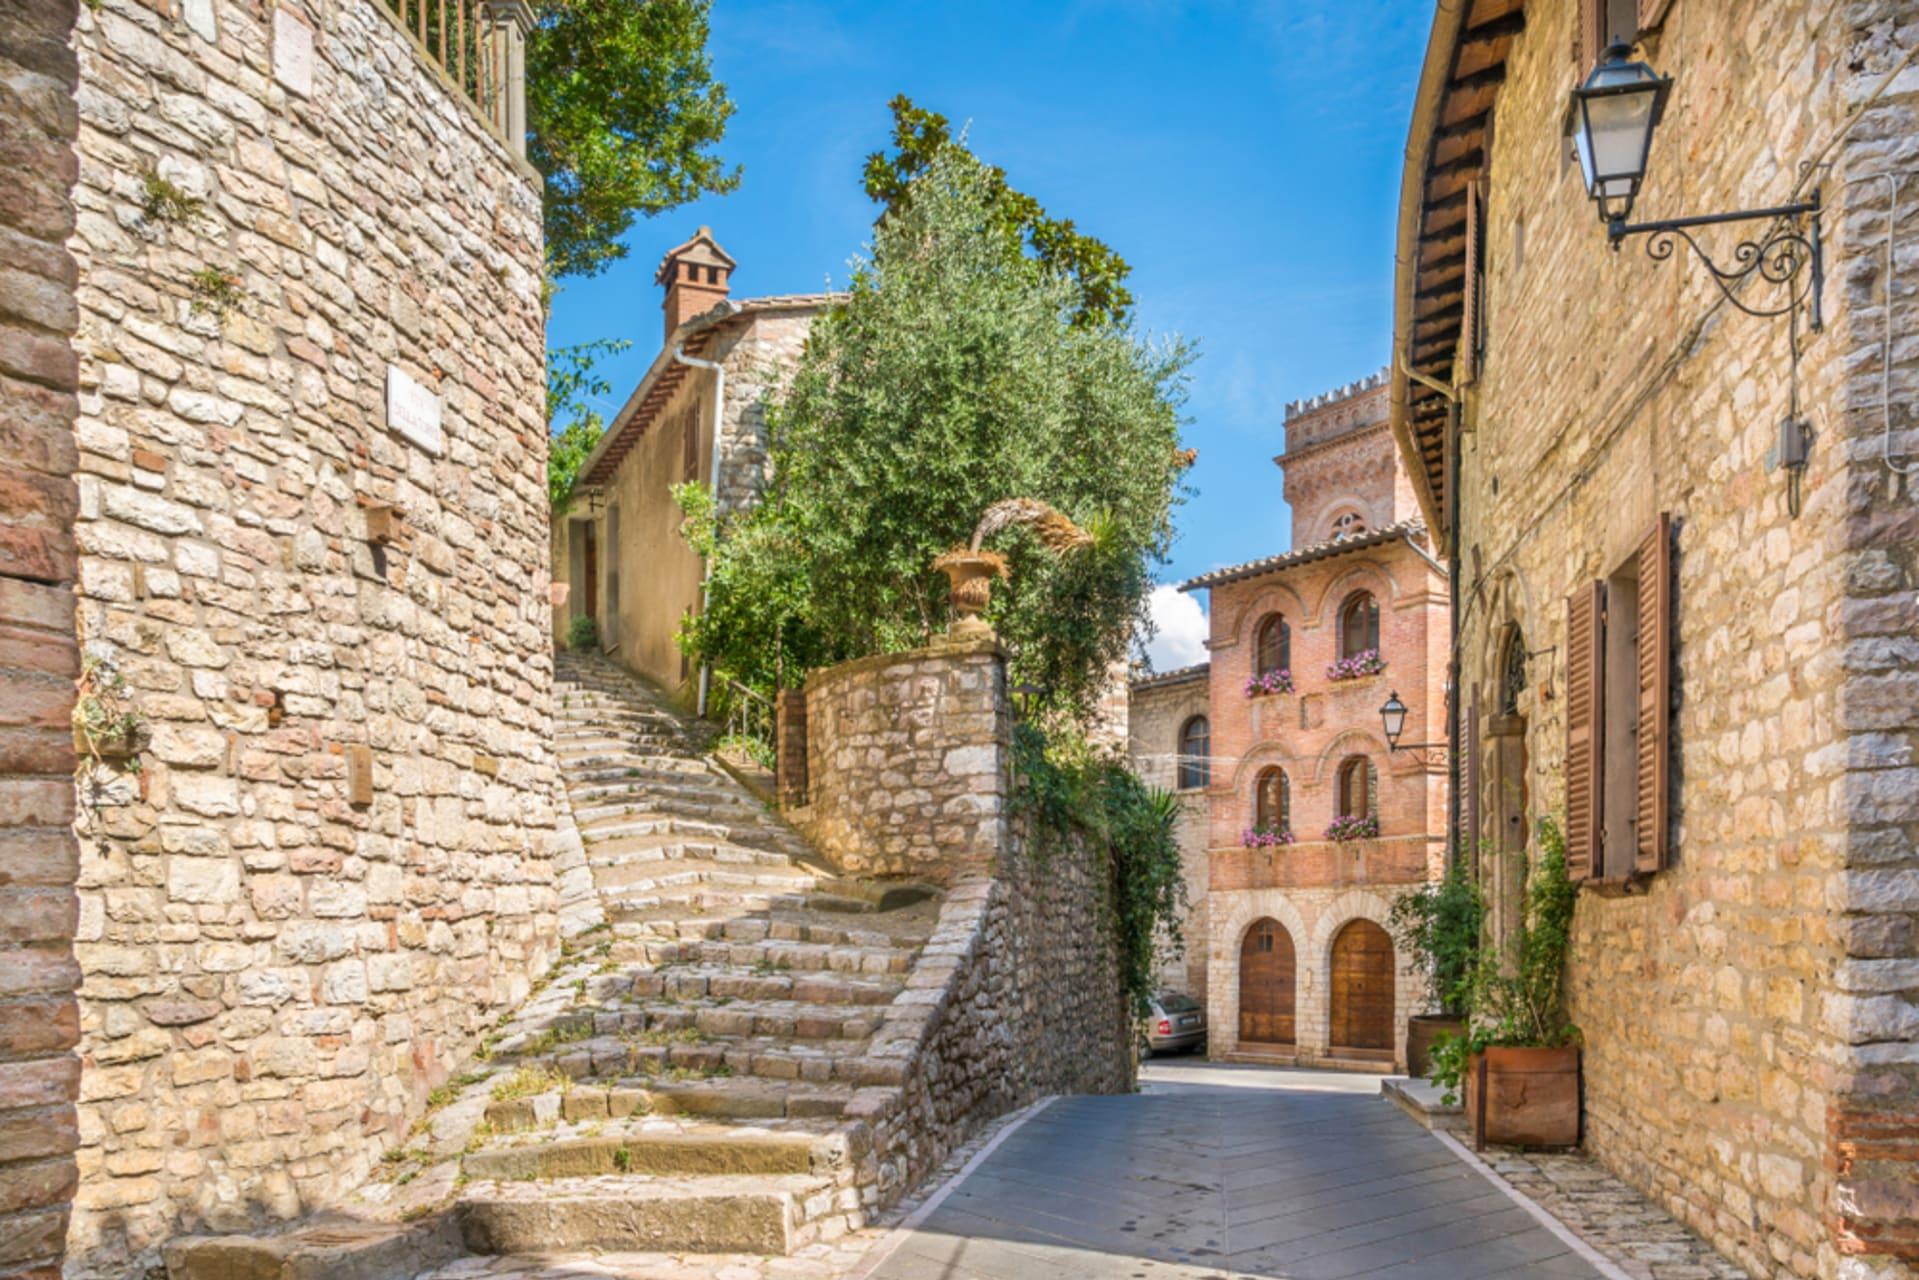 Umbria - Corciano - A Medieval Castle Village